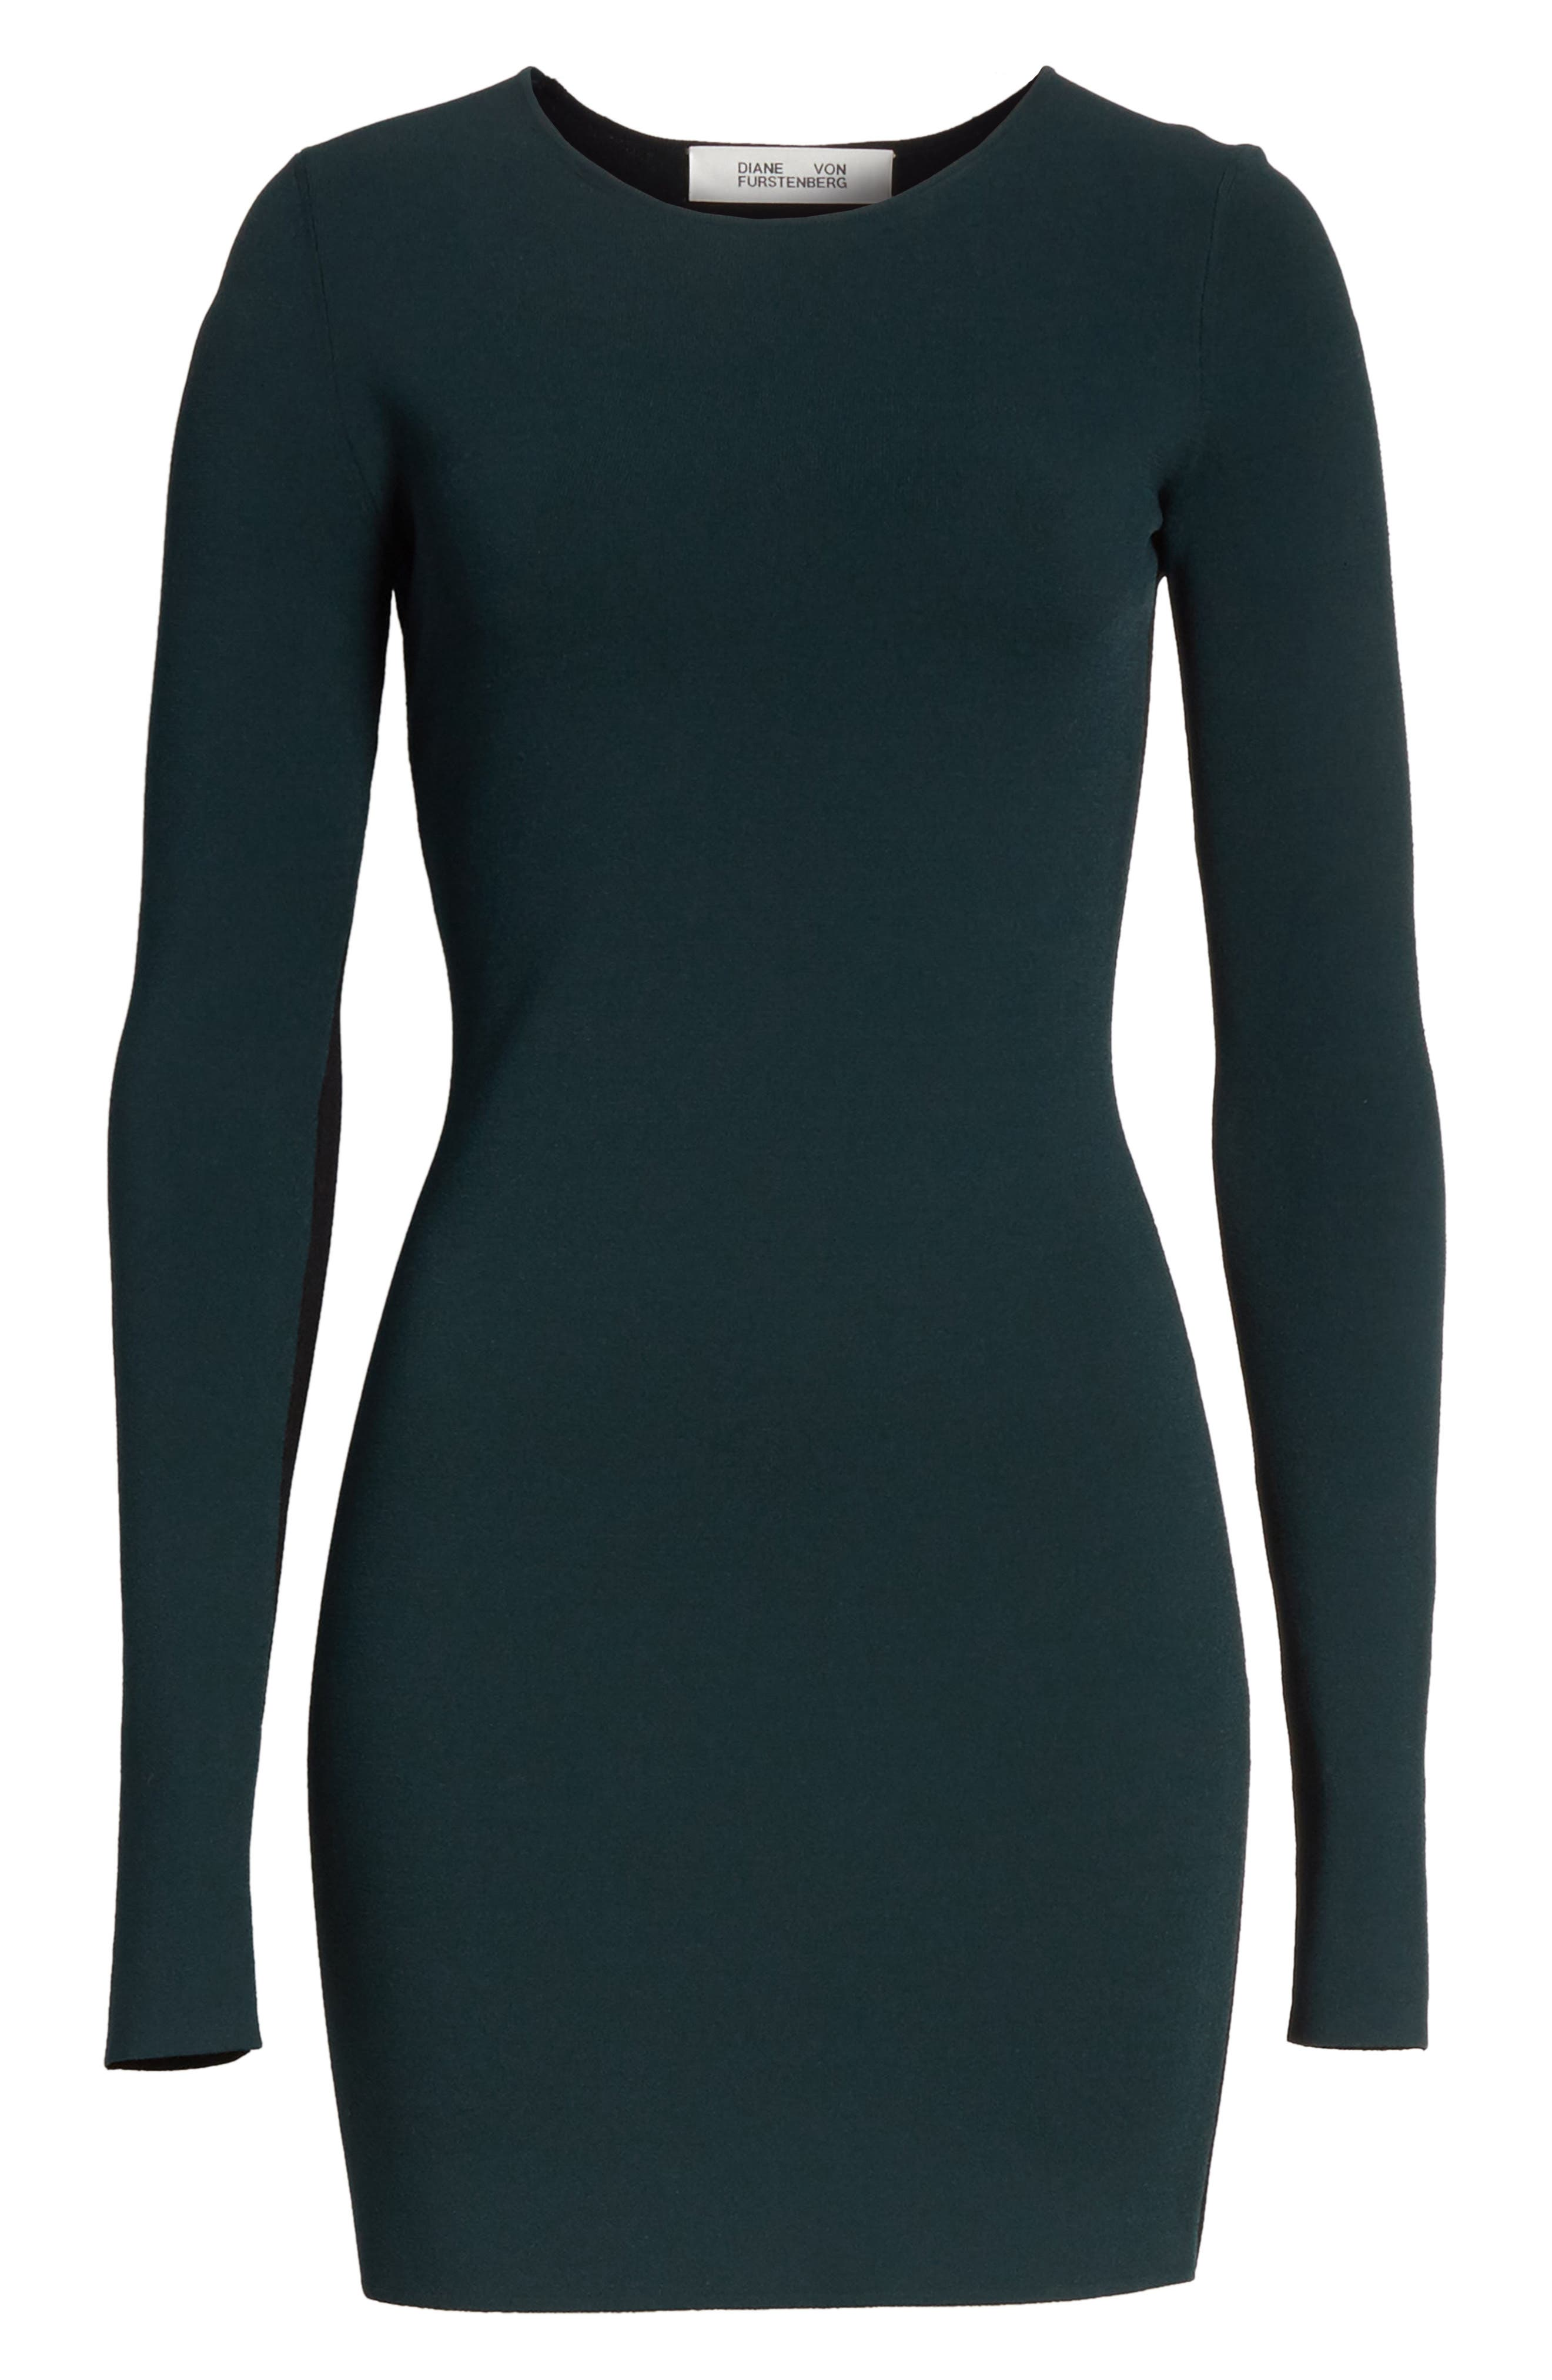 Diane von Furstenberg Long Sleeve Minidress,                             Alternate thumbnail 6, color,                             361